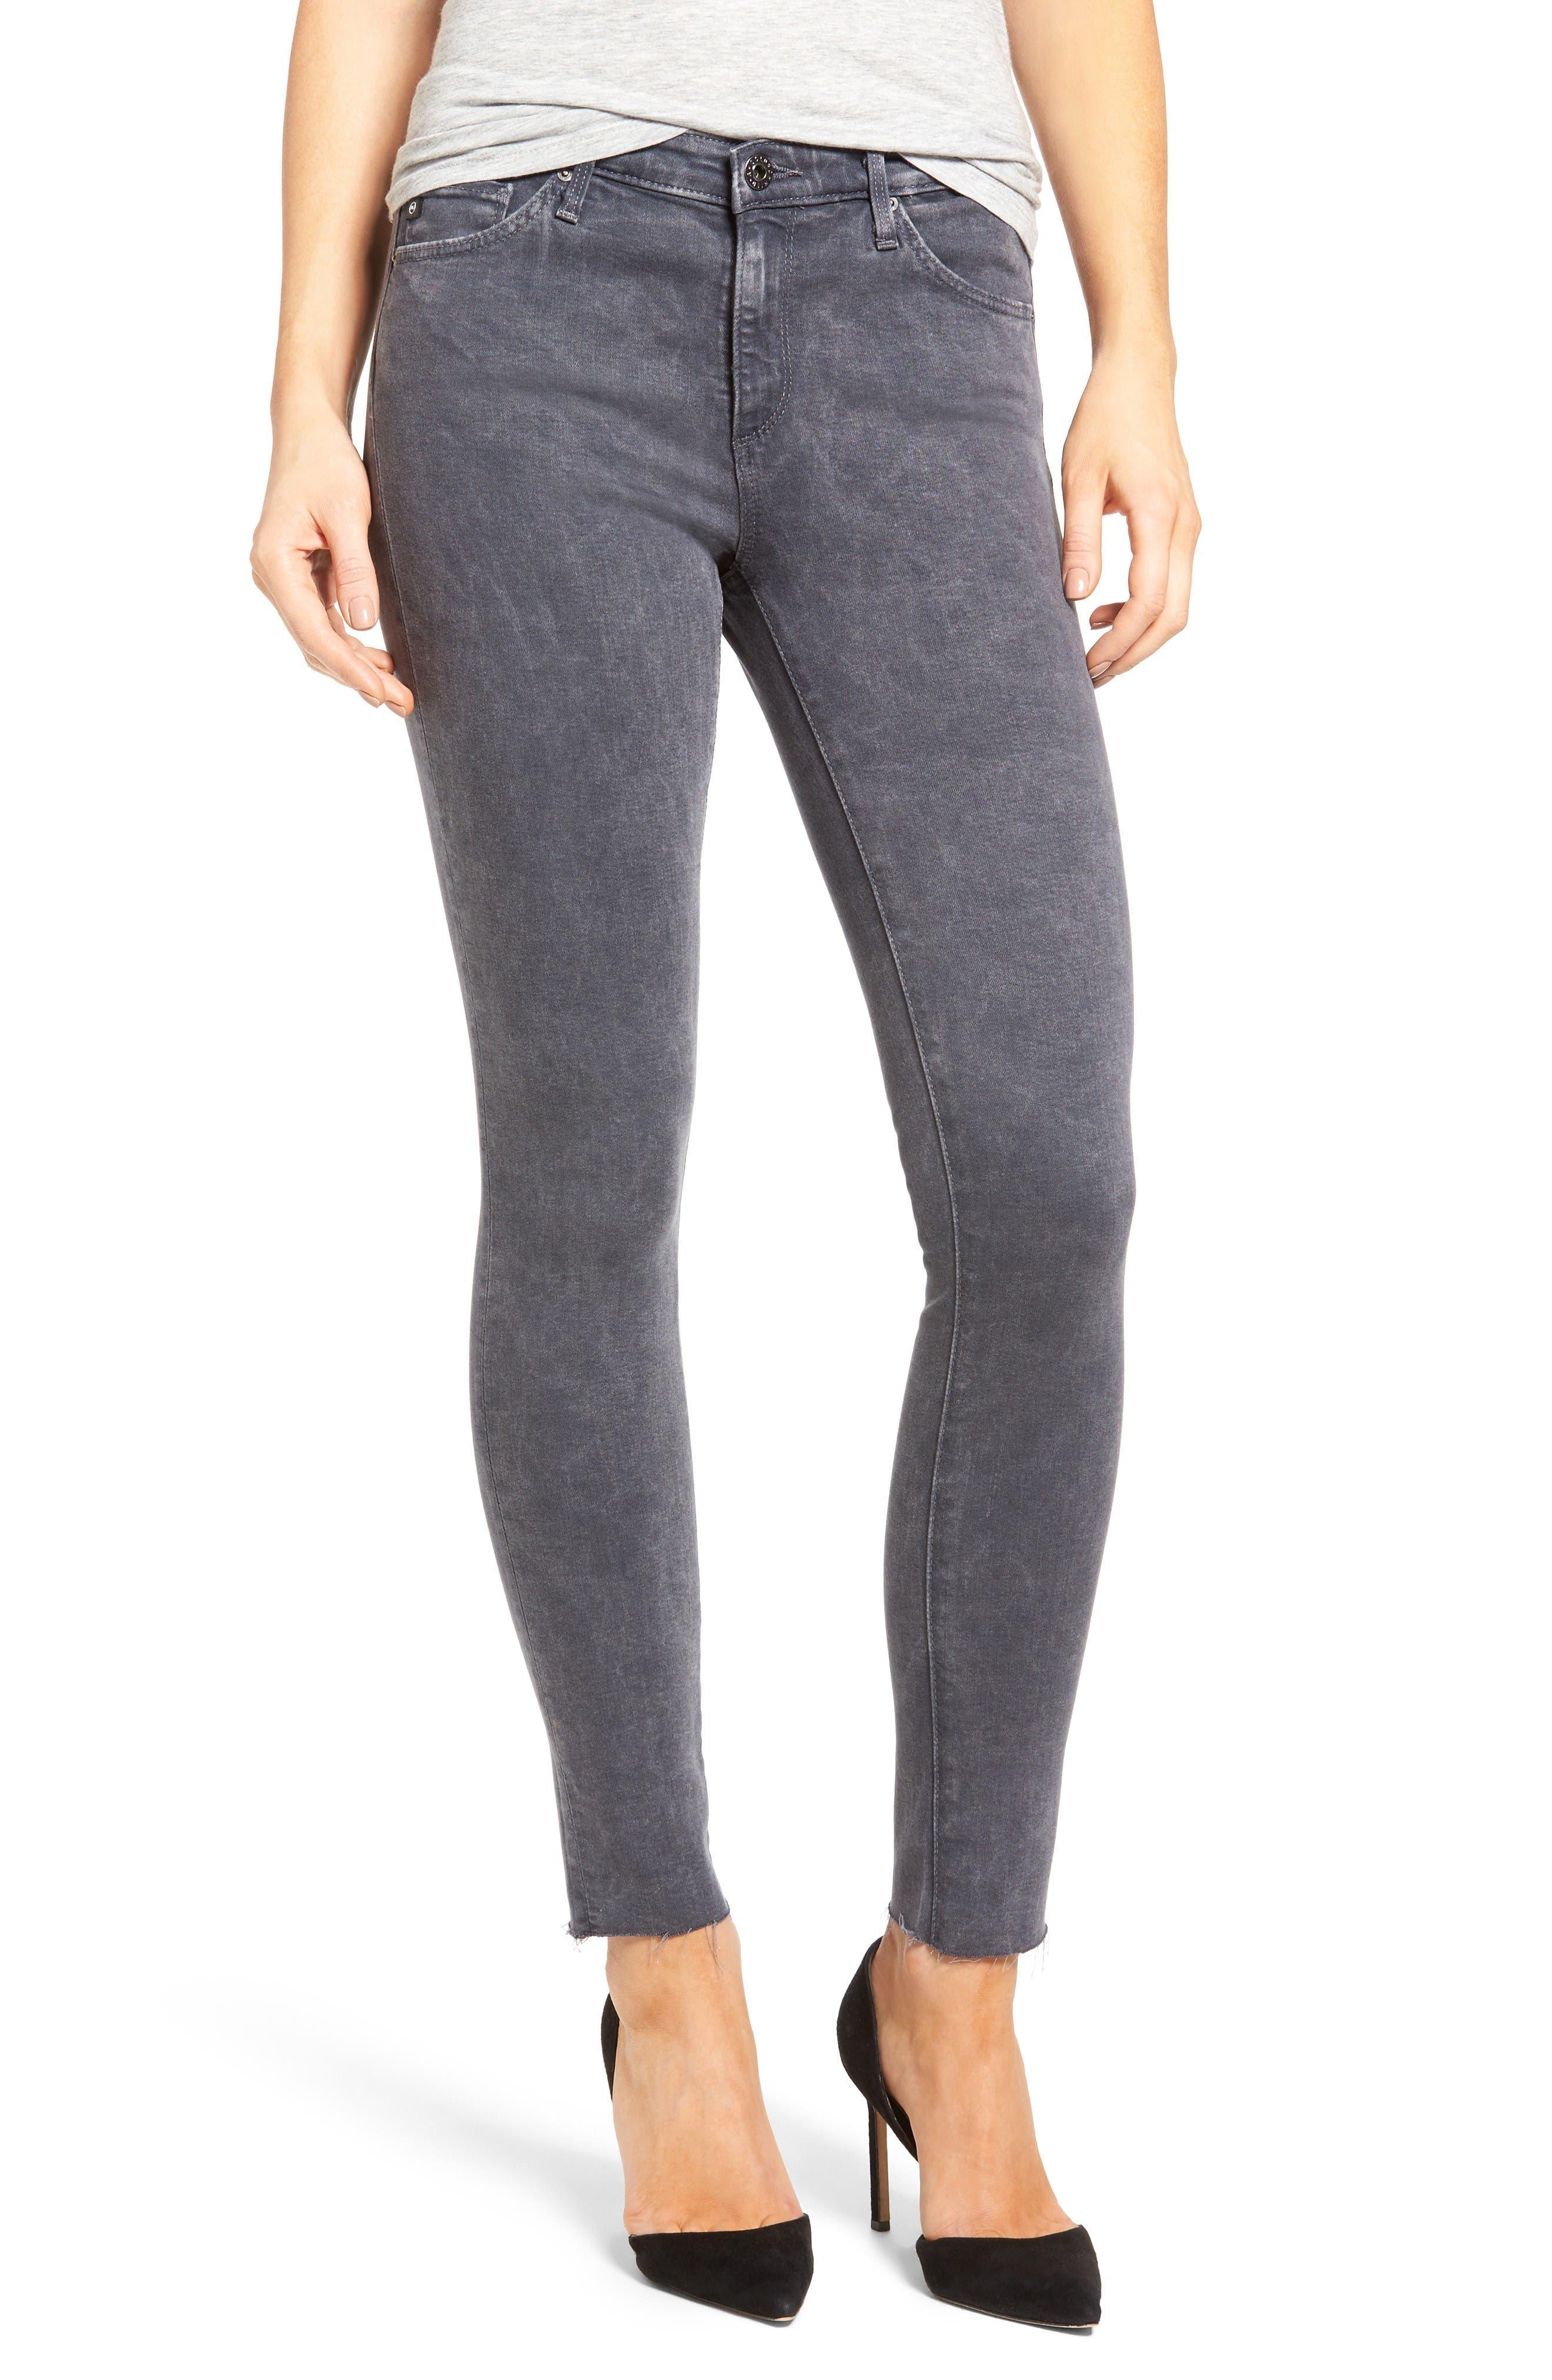 Main Image - AG Middi Ankle Skinny Jeans (Erosion)